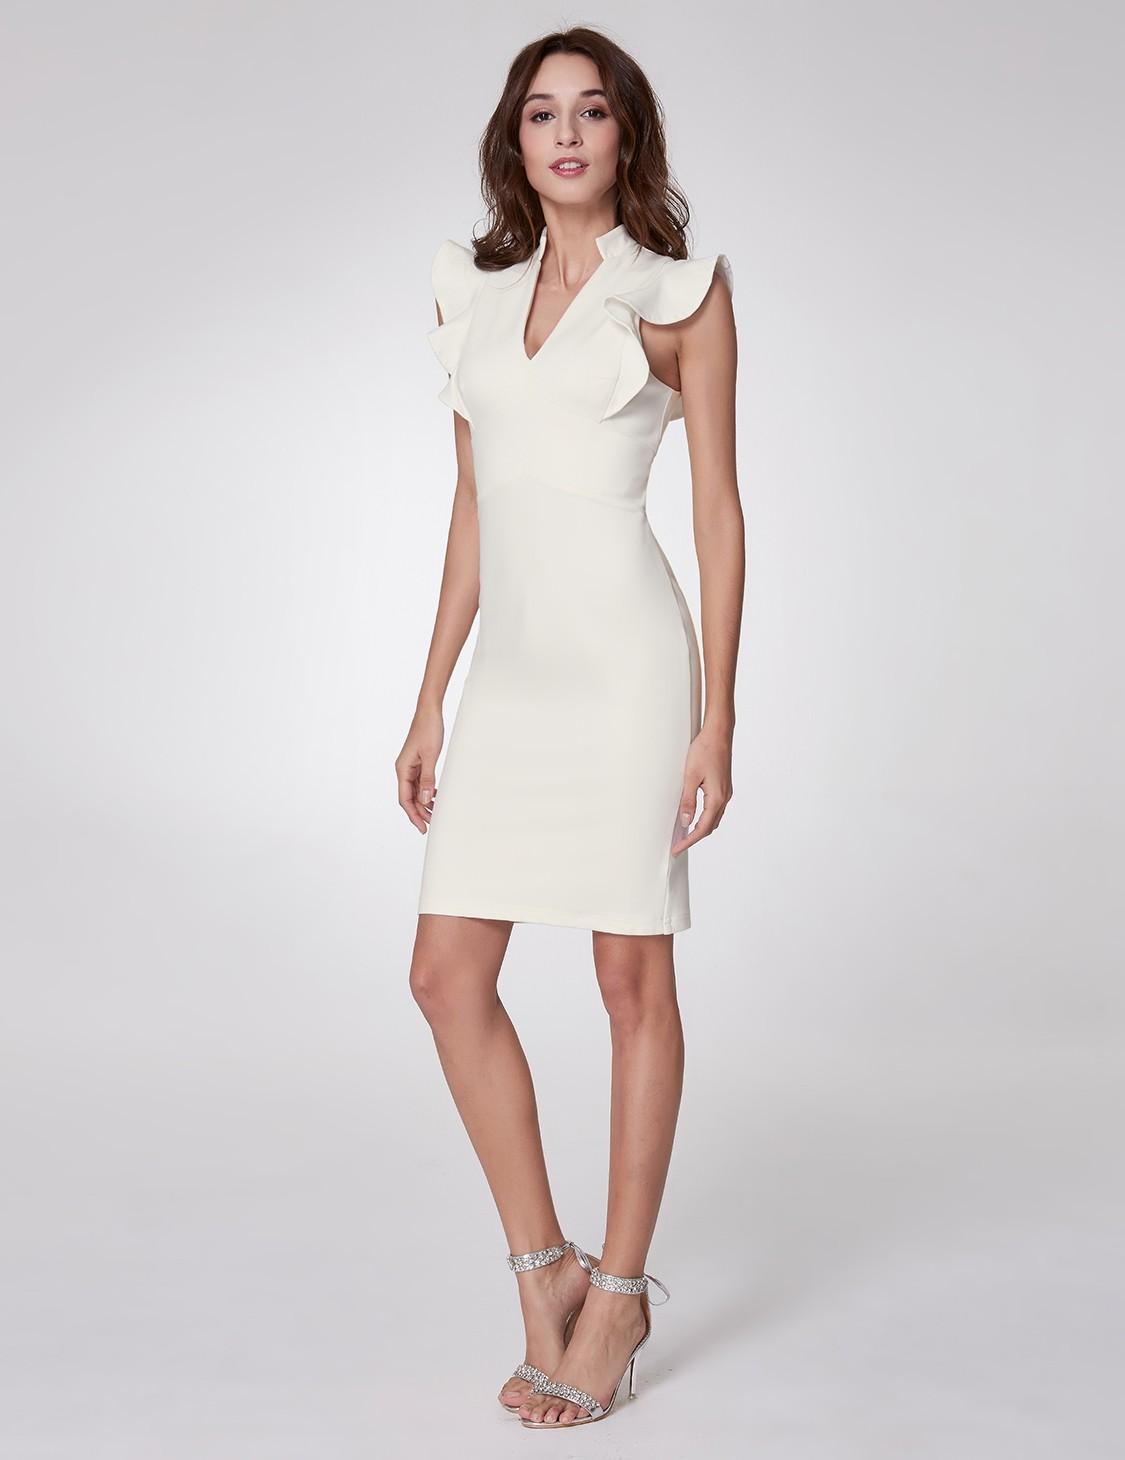 White Cocktail Prom Dress